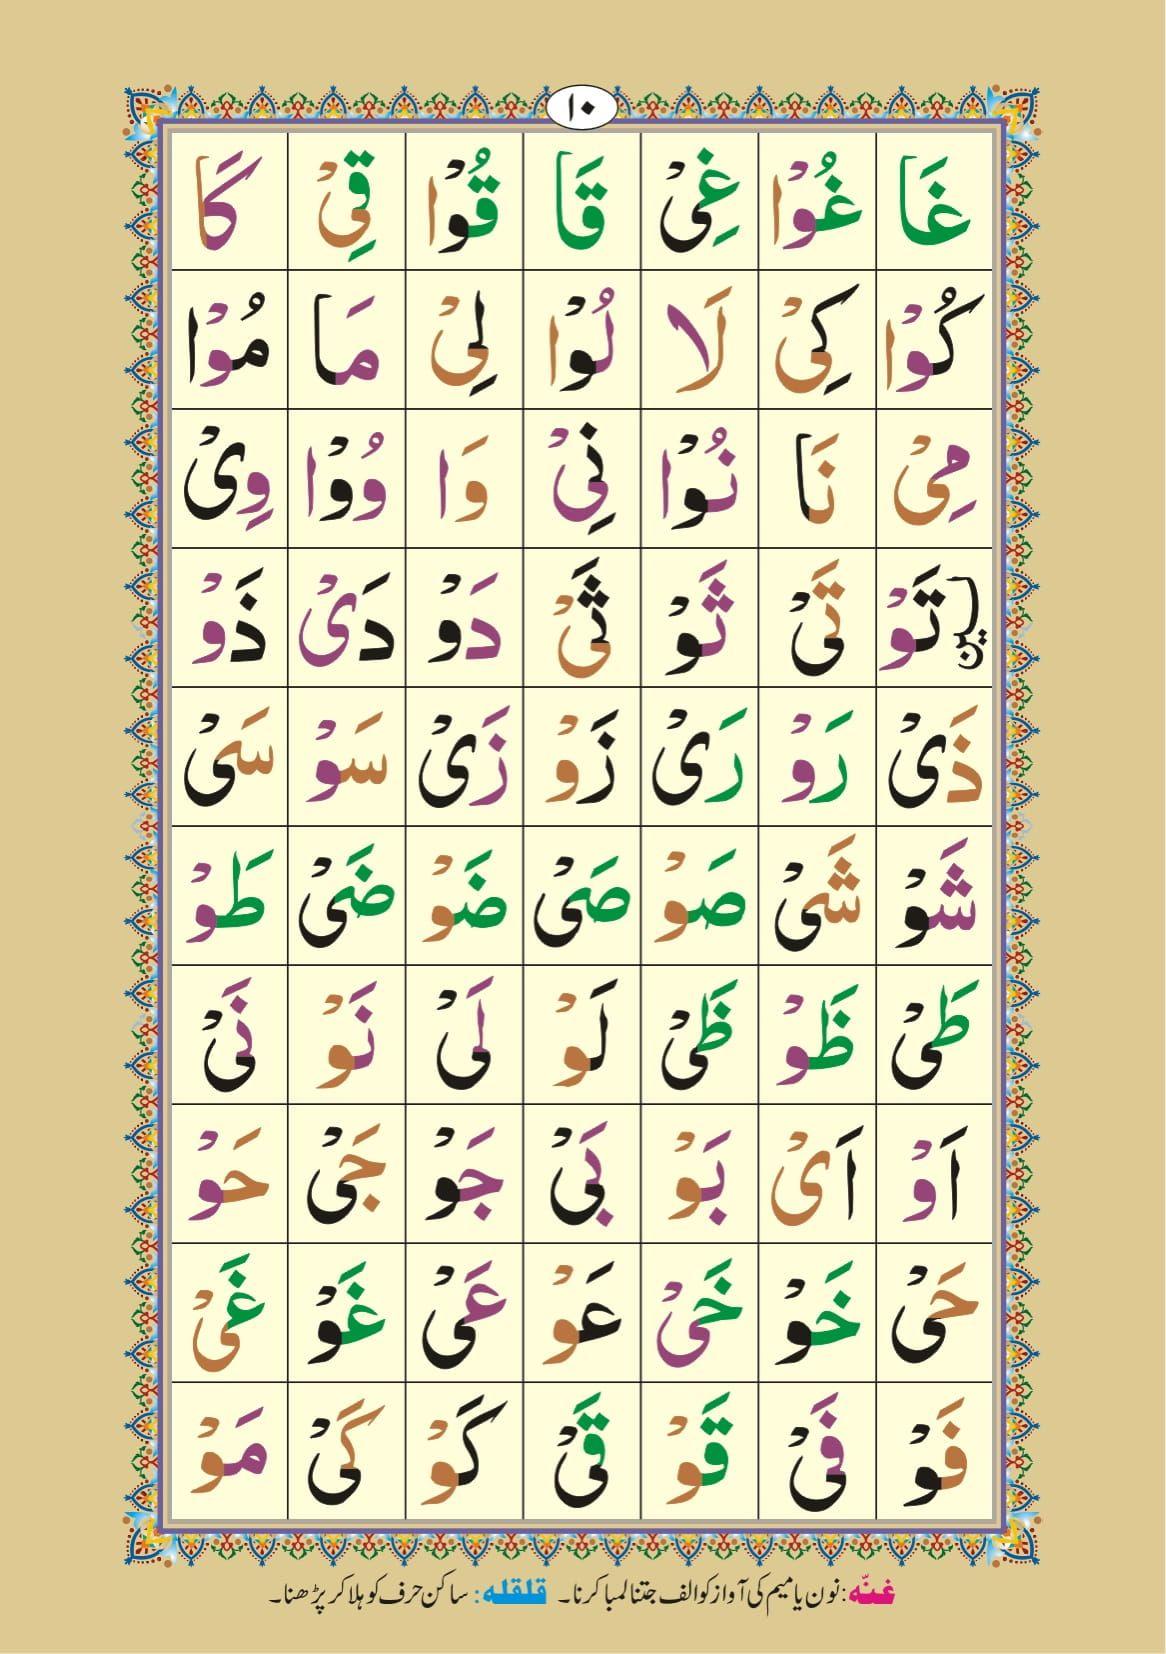 Quran Pak | Quran | Quran, Quran pak, Word search